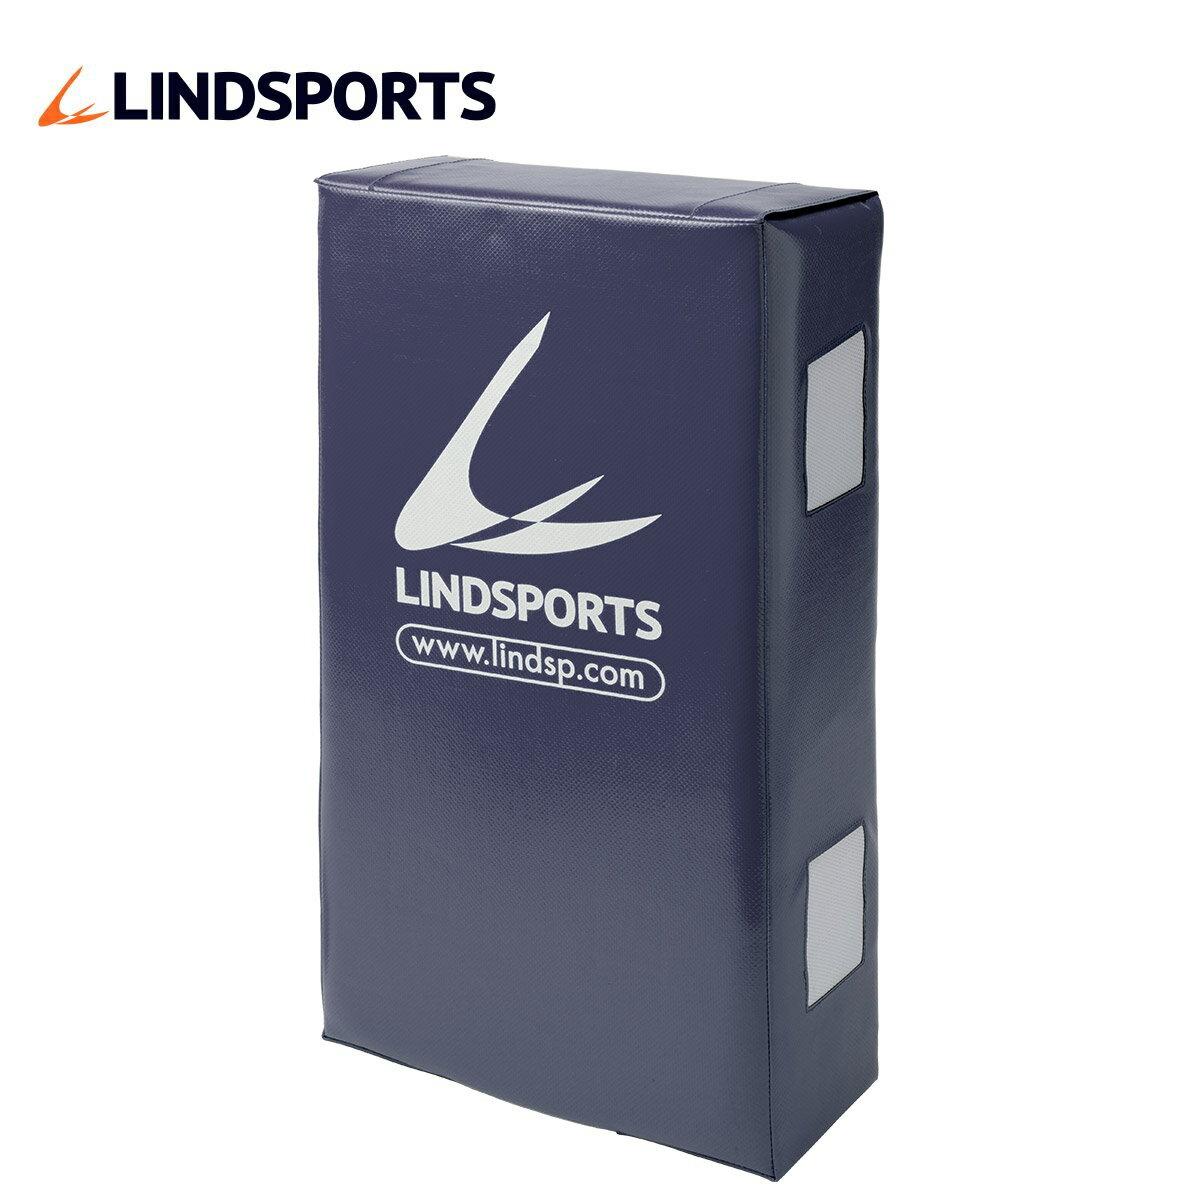 LINDSPORTS ヒットバッグ フラットタイプ【コンタクトバッグ/コンタクトバック/ヒットバック/ハンドダミー/ラグビー/バスケットボール】